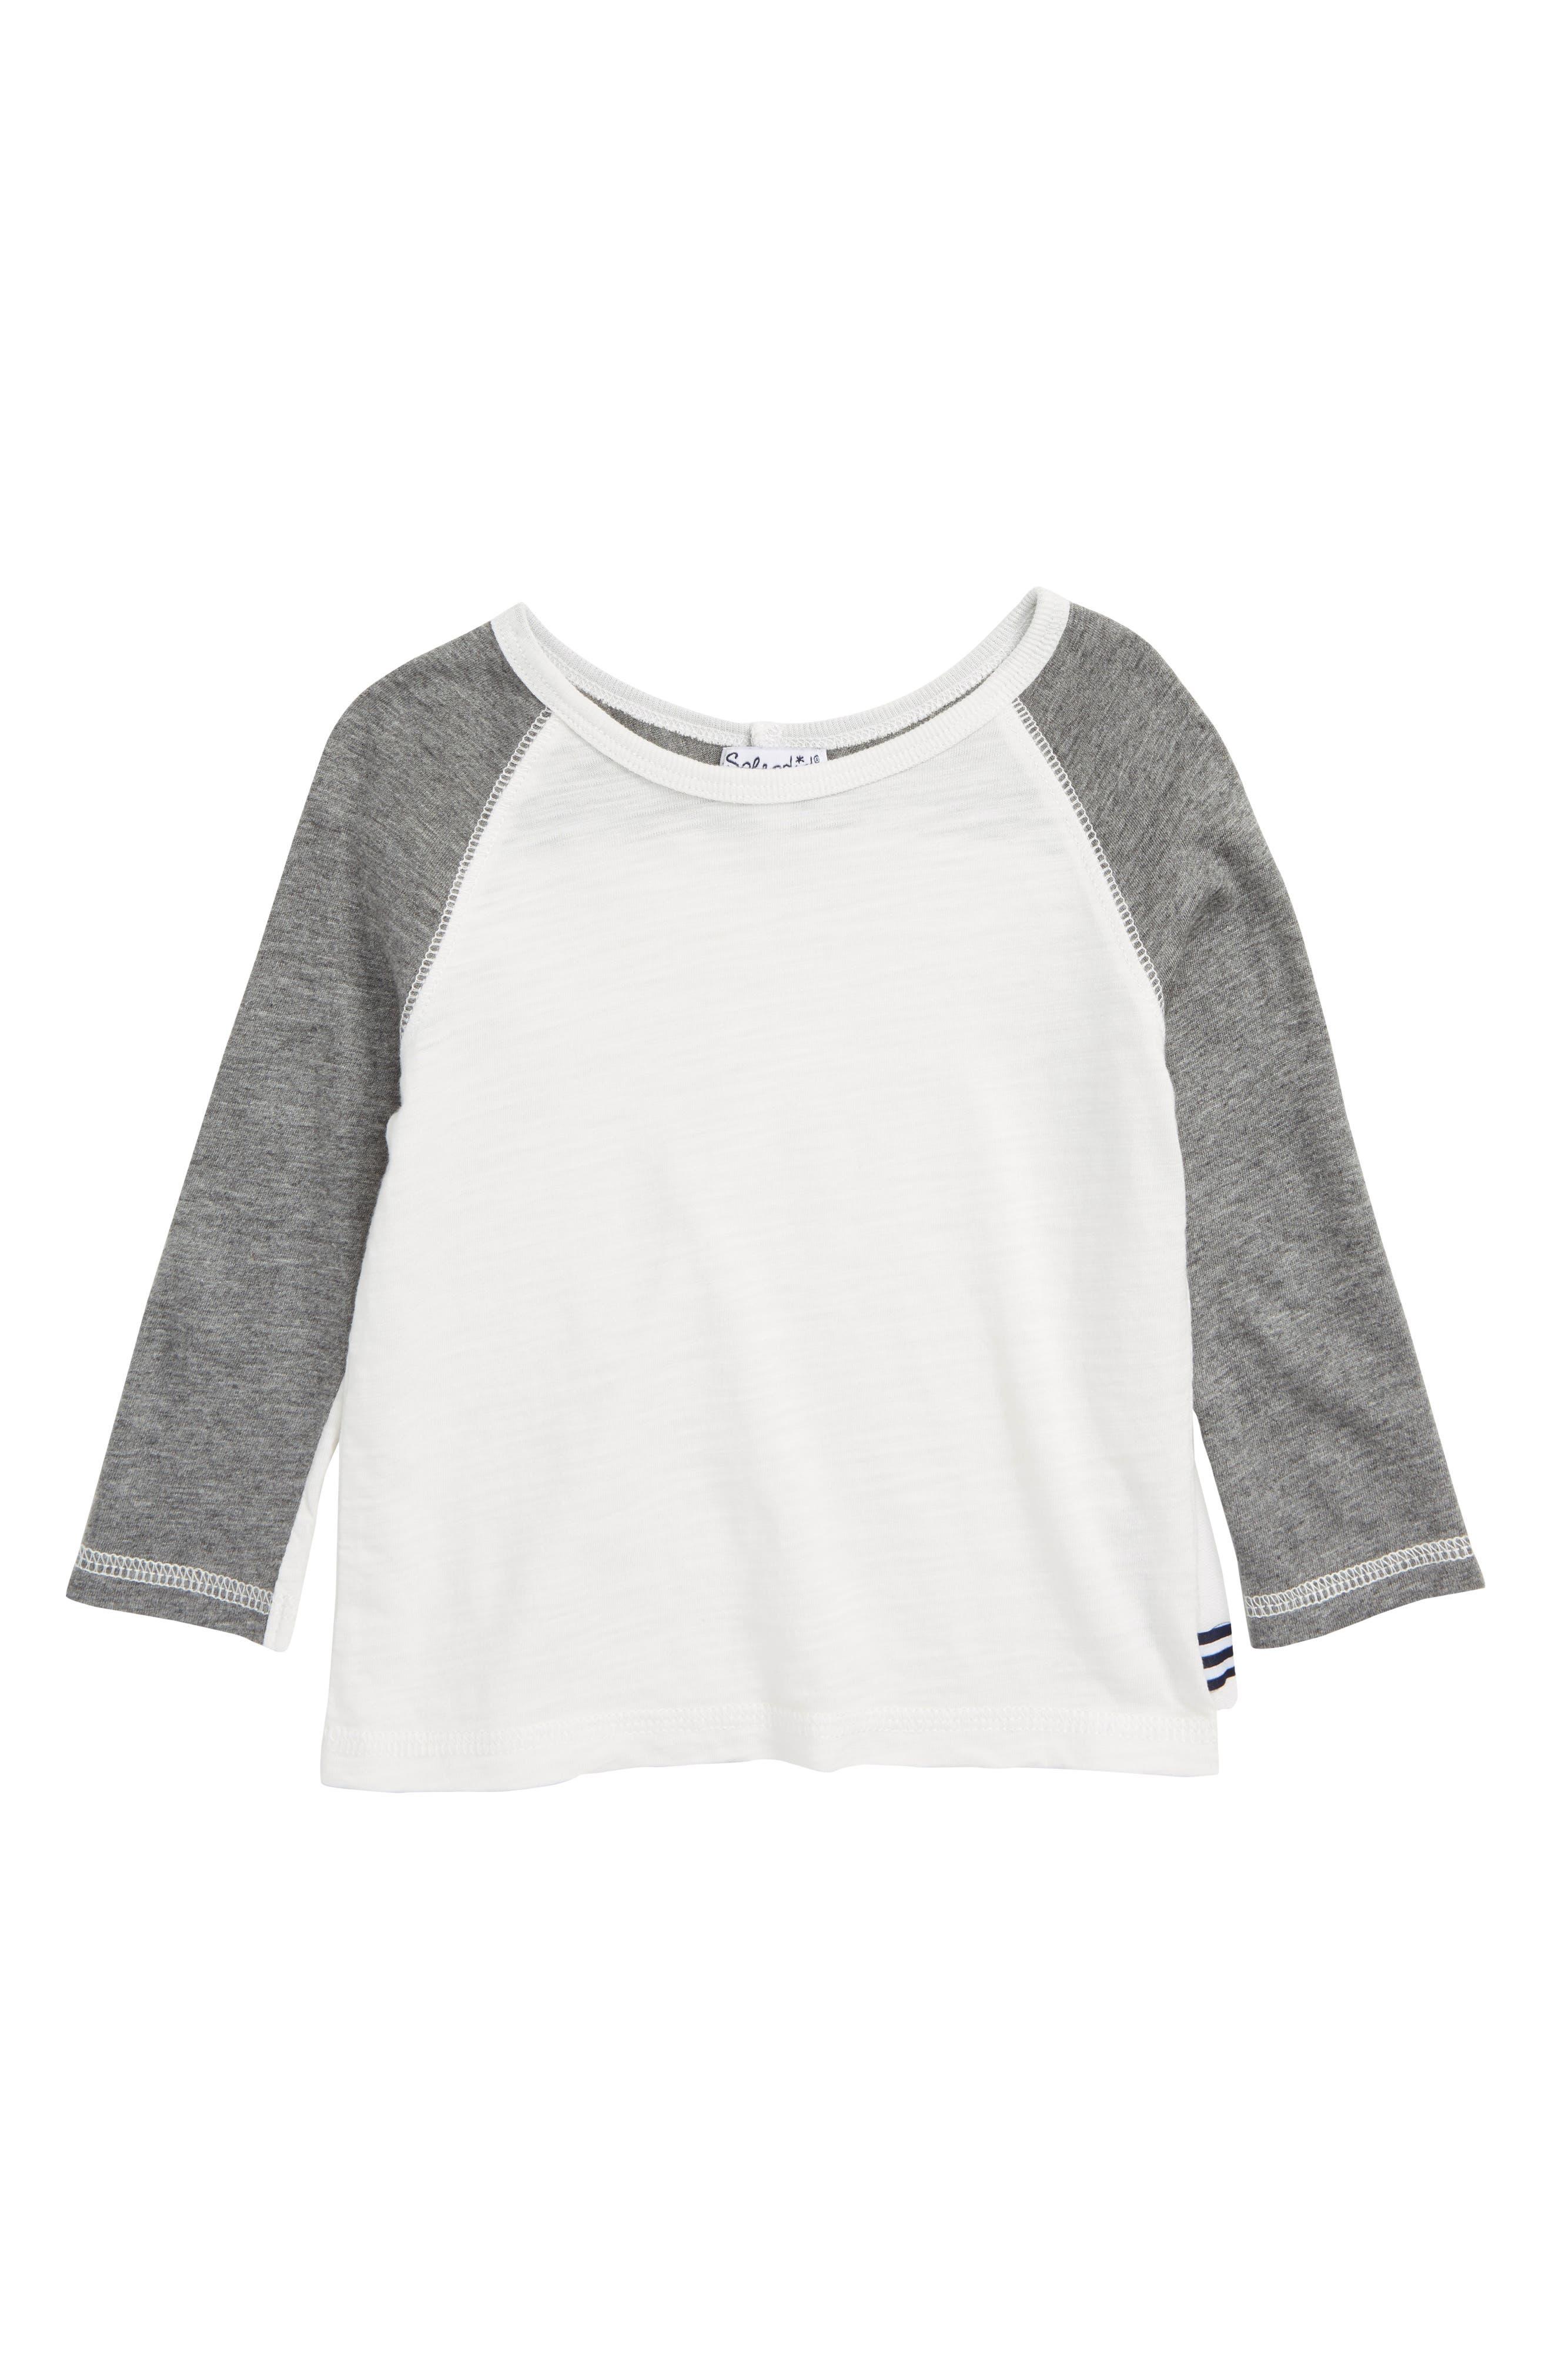 Always Raglan T-Shirt,                             Main thumbnail 1, color,                             OFF WHITE/ GREY